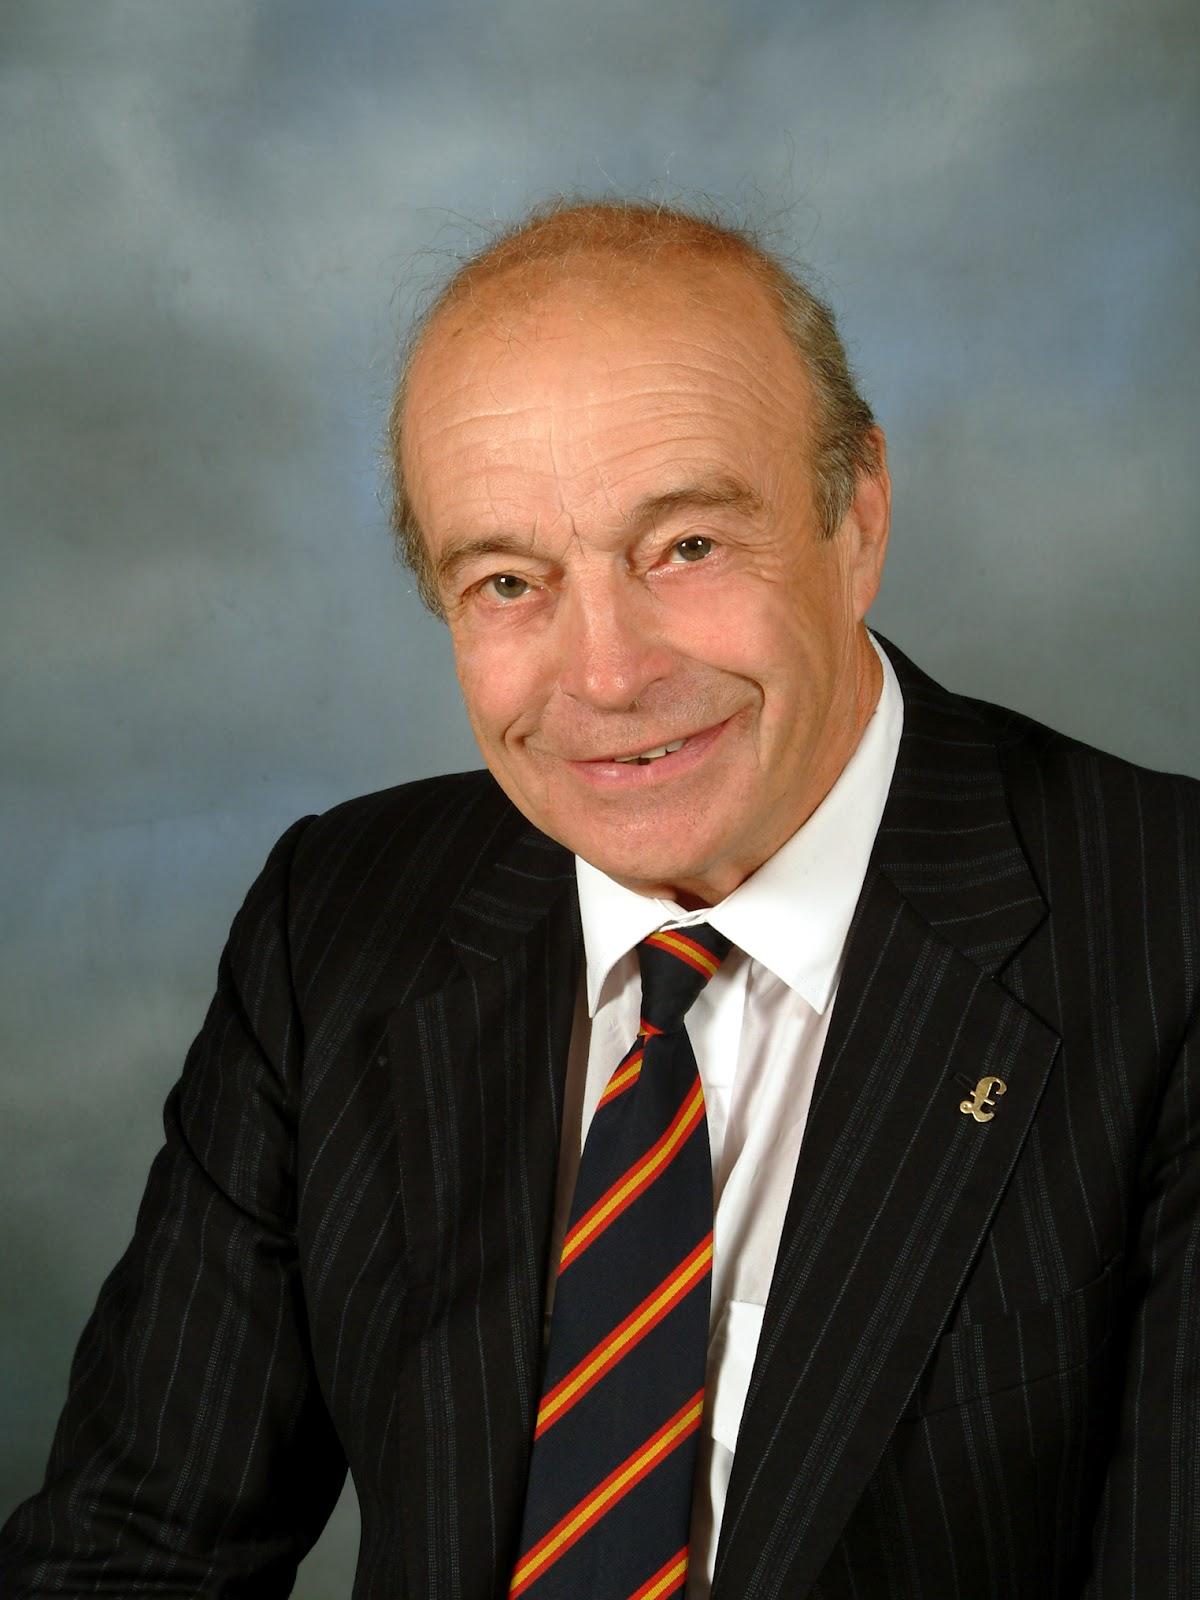 UKIP - vs - EUkip: #0744* - UKIP Loses Another Councillor